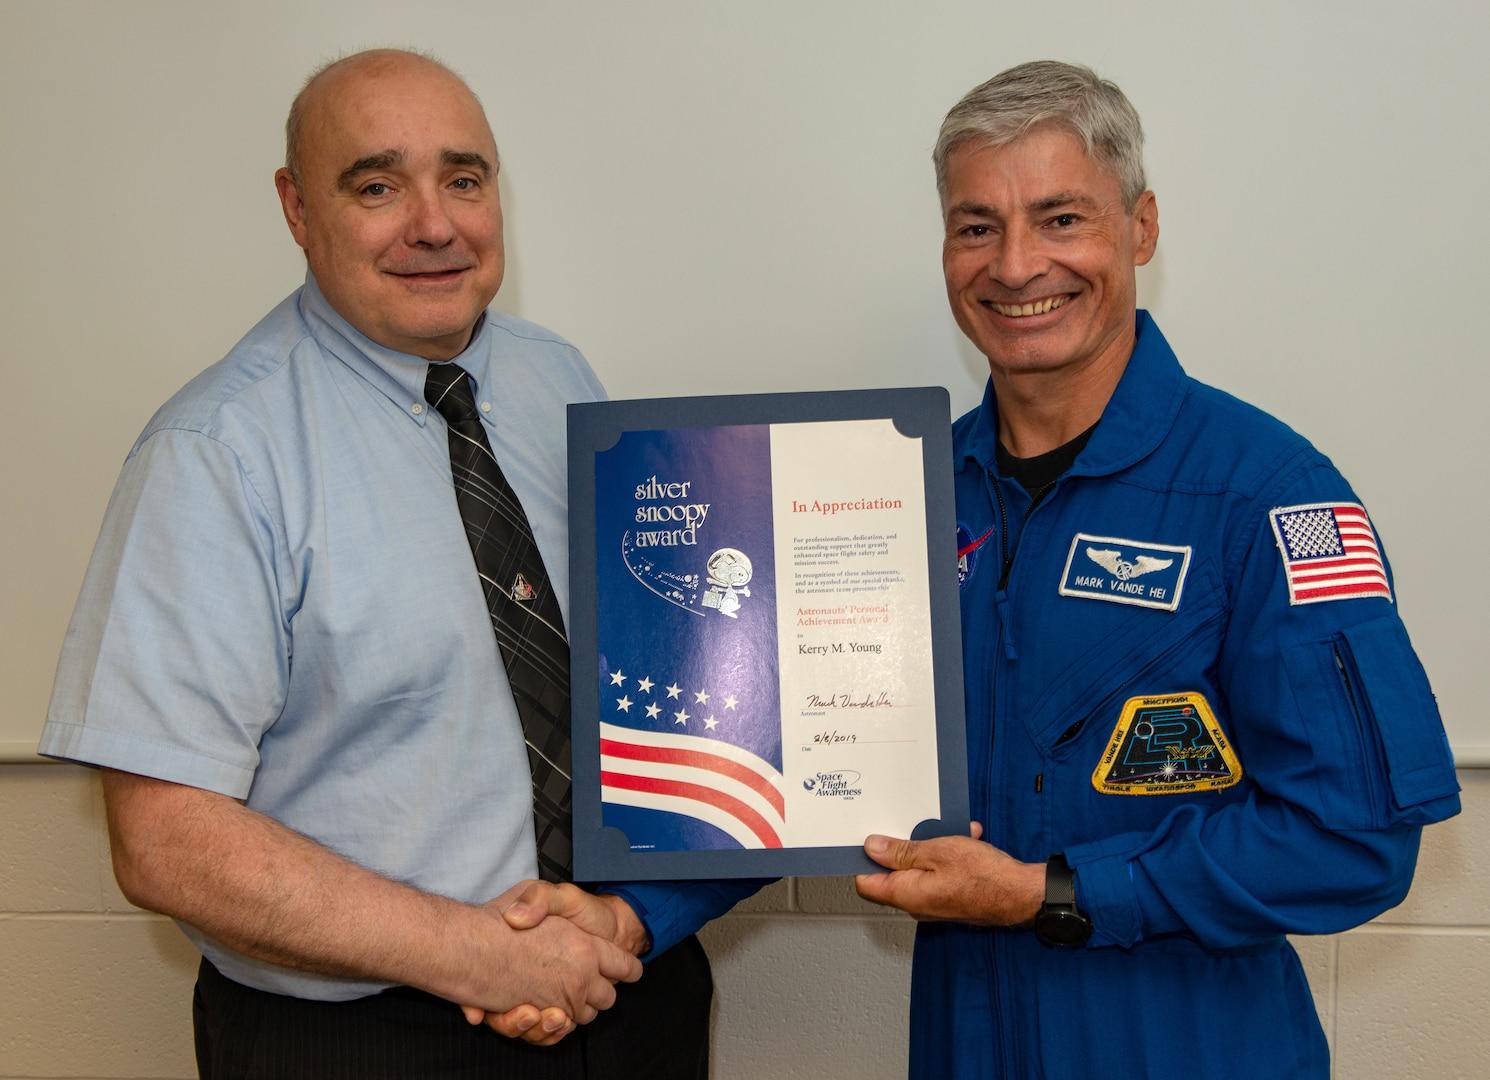 A man in a blue astronaut uniform hands a certificate to another man